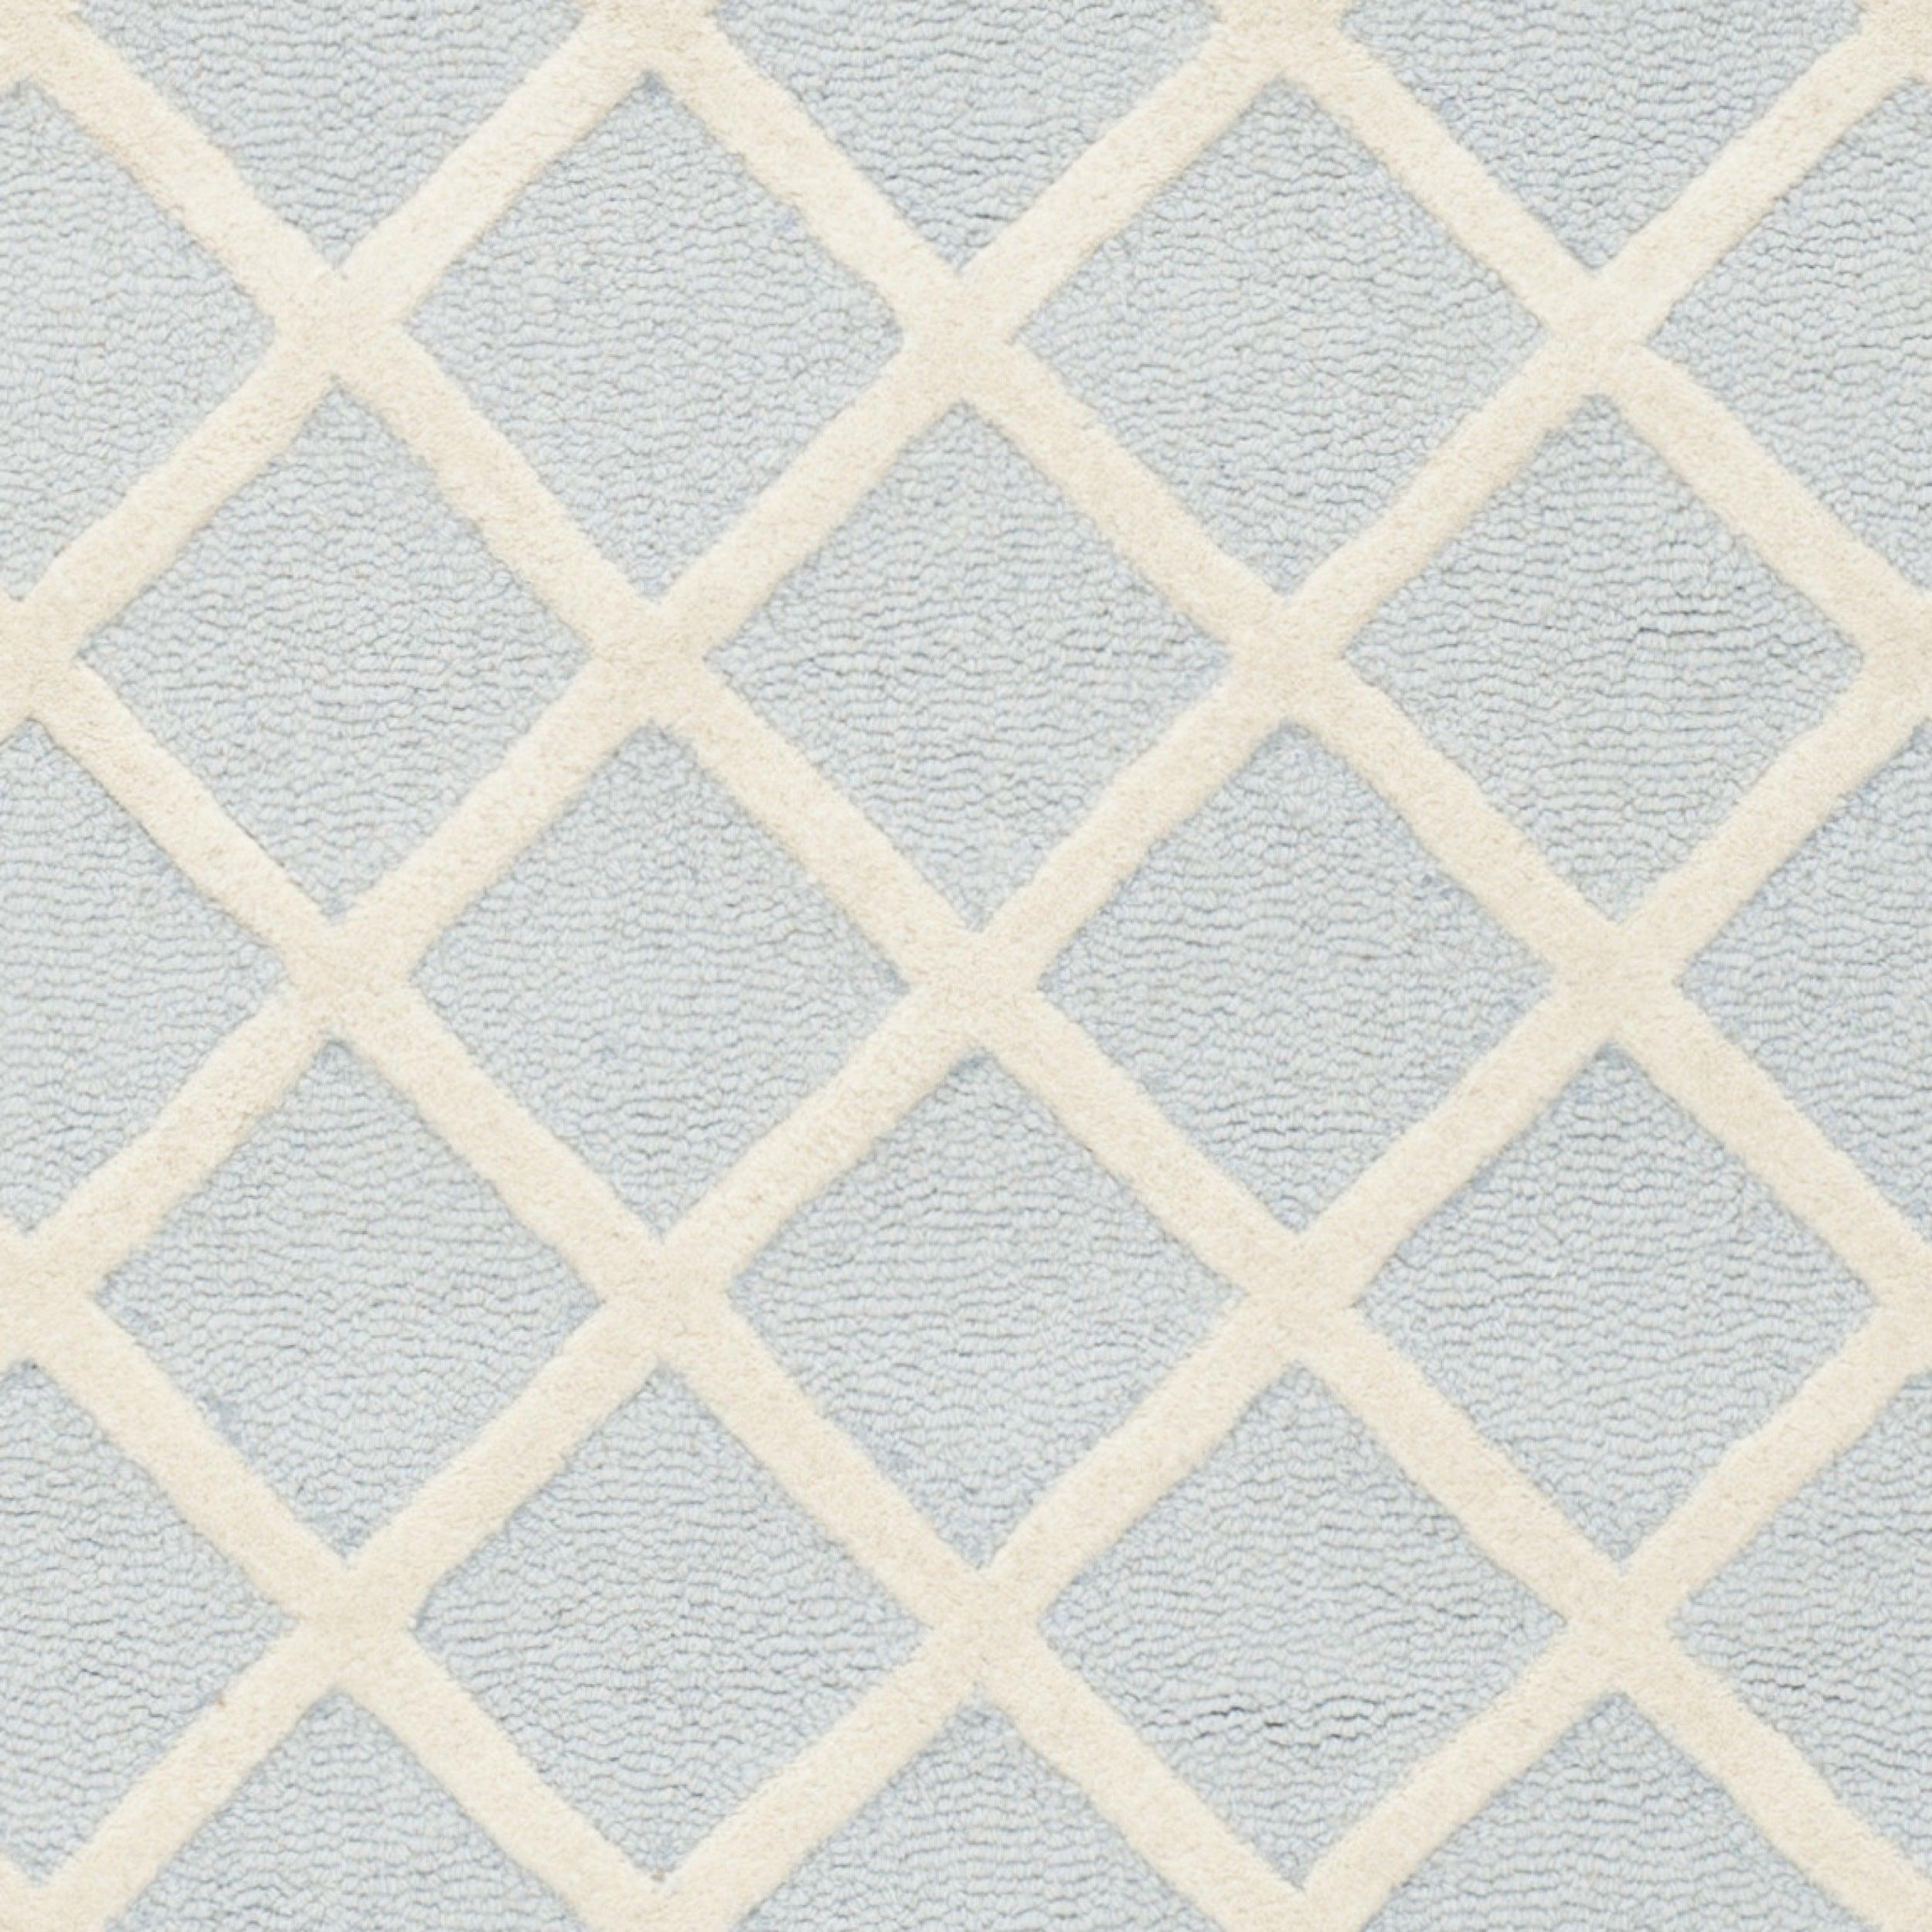 Safavieh Handmade Cambridge Light Blue Ivory Wool Rug